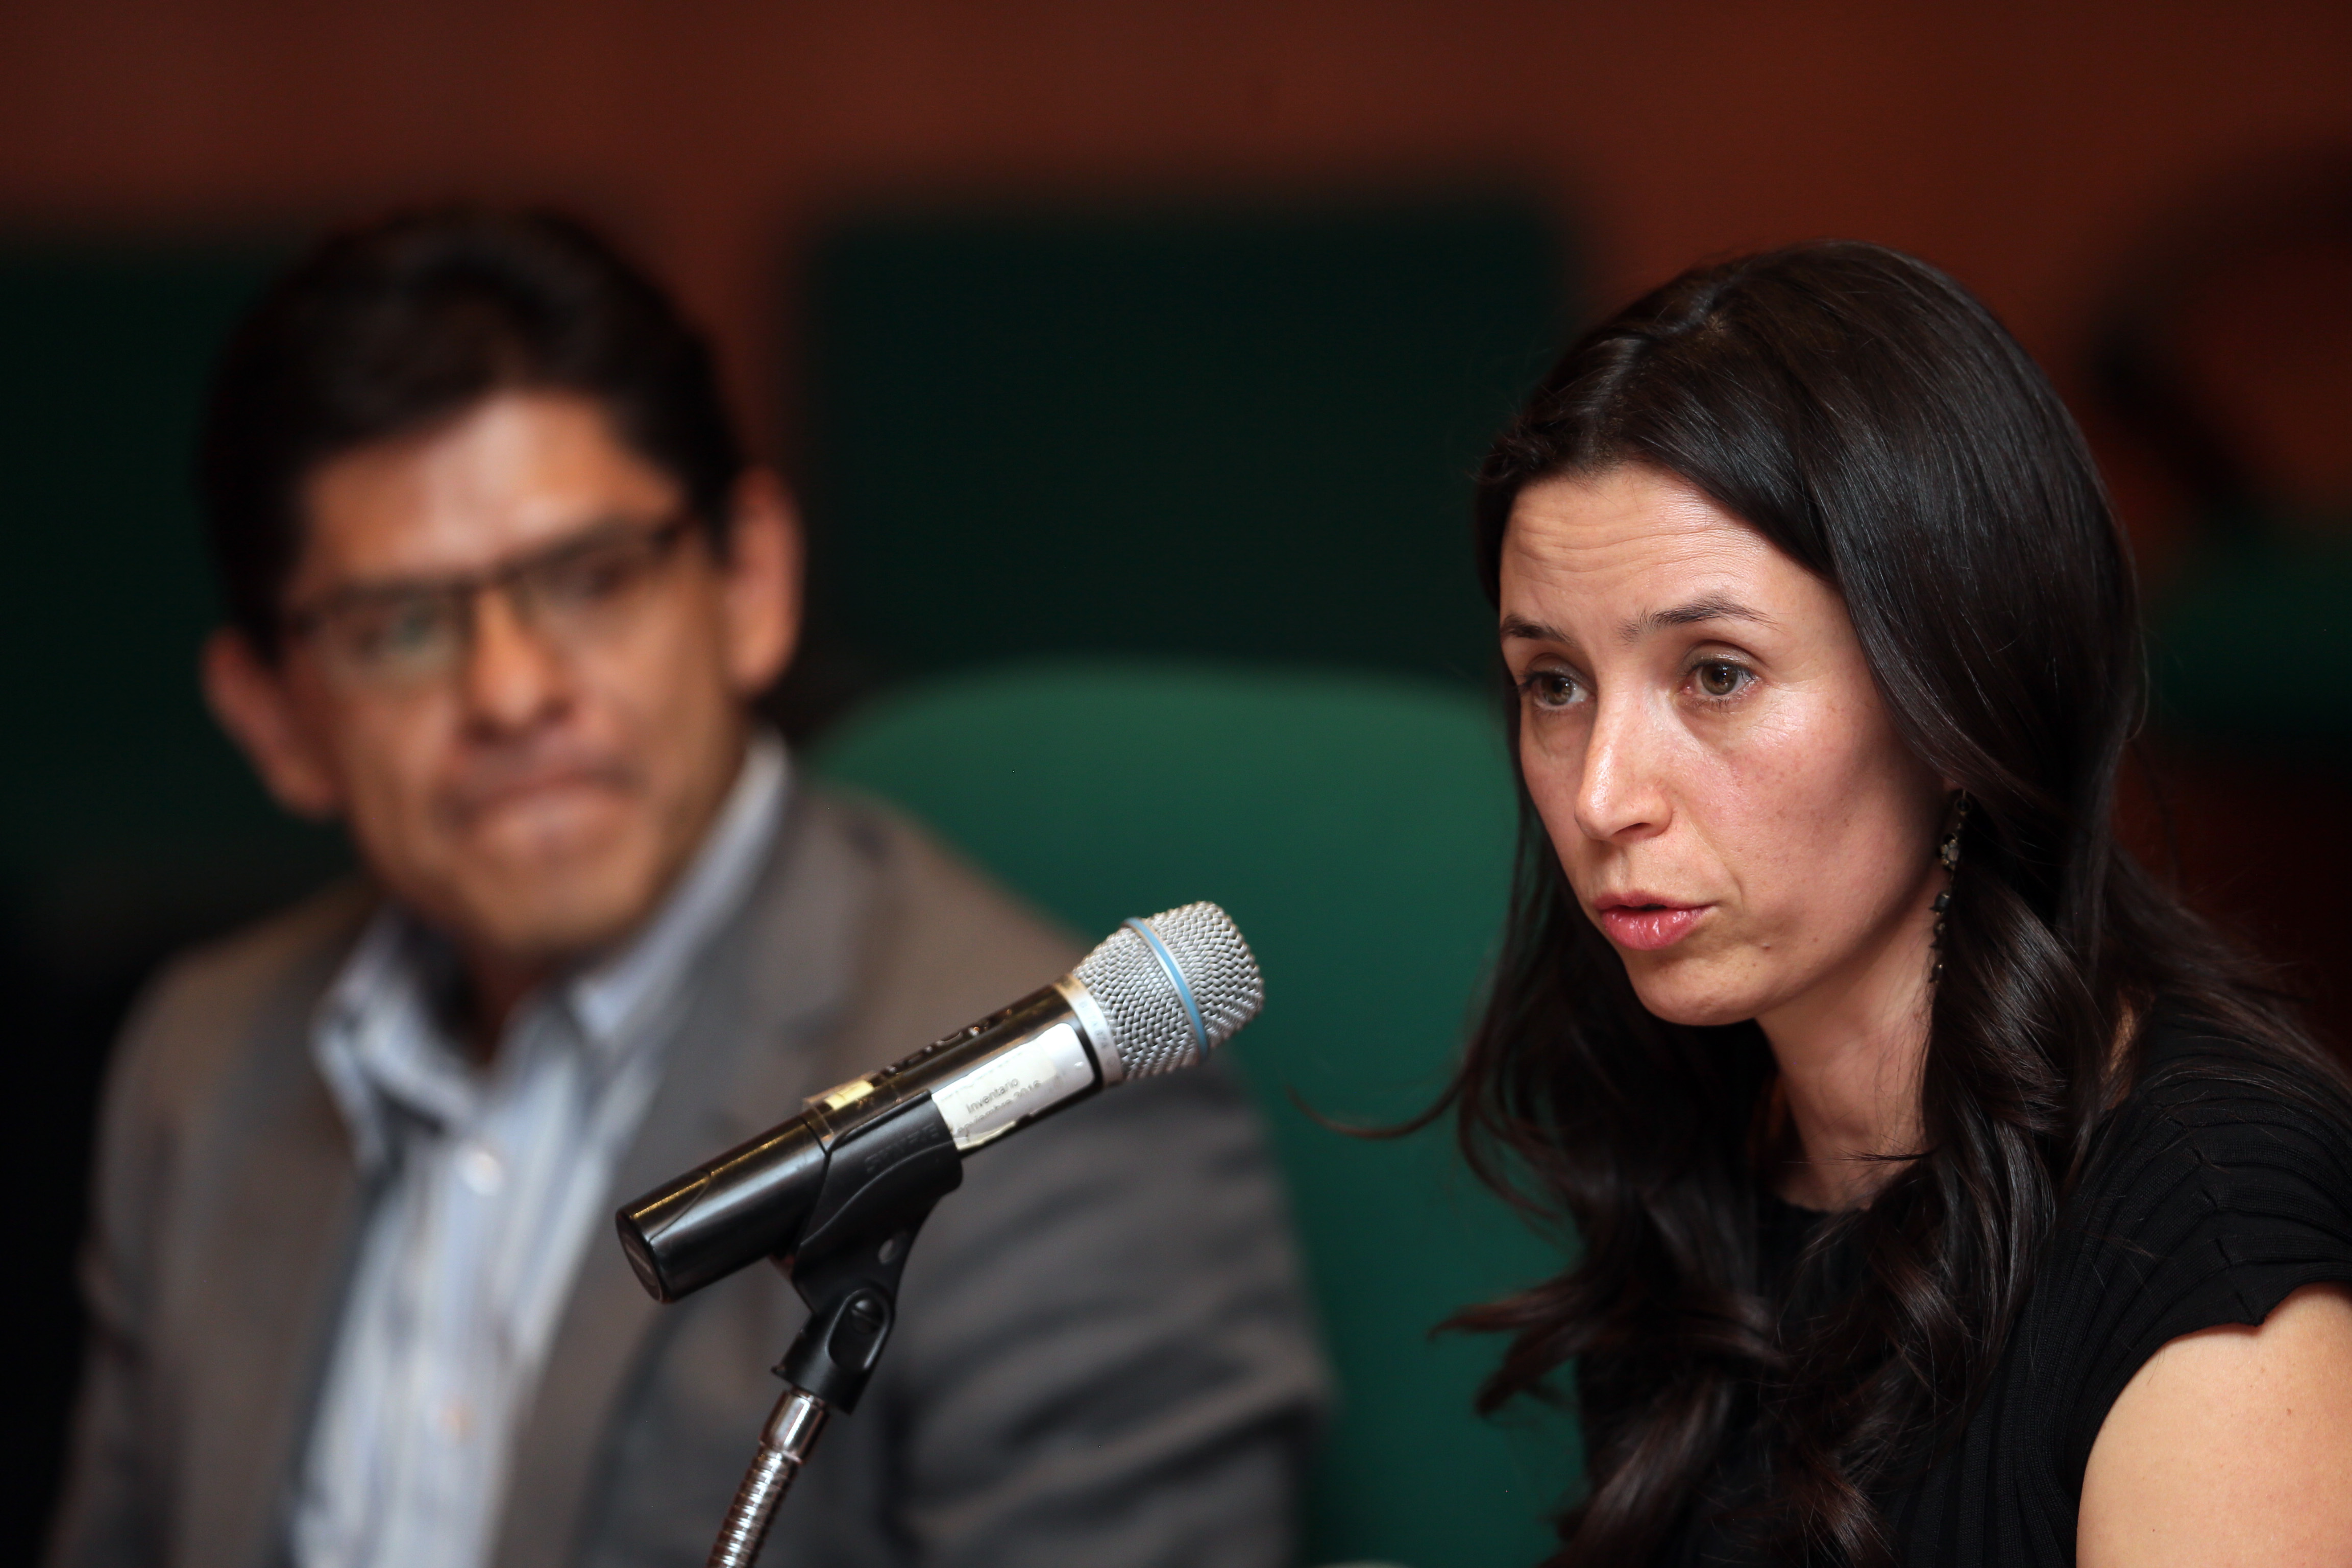 La Academia Mexicana de Criminología nombra <i>Miembro de Número</i> a Catalina Pérez